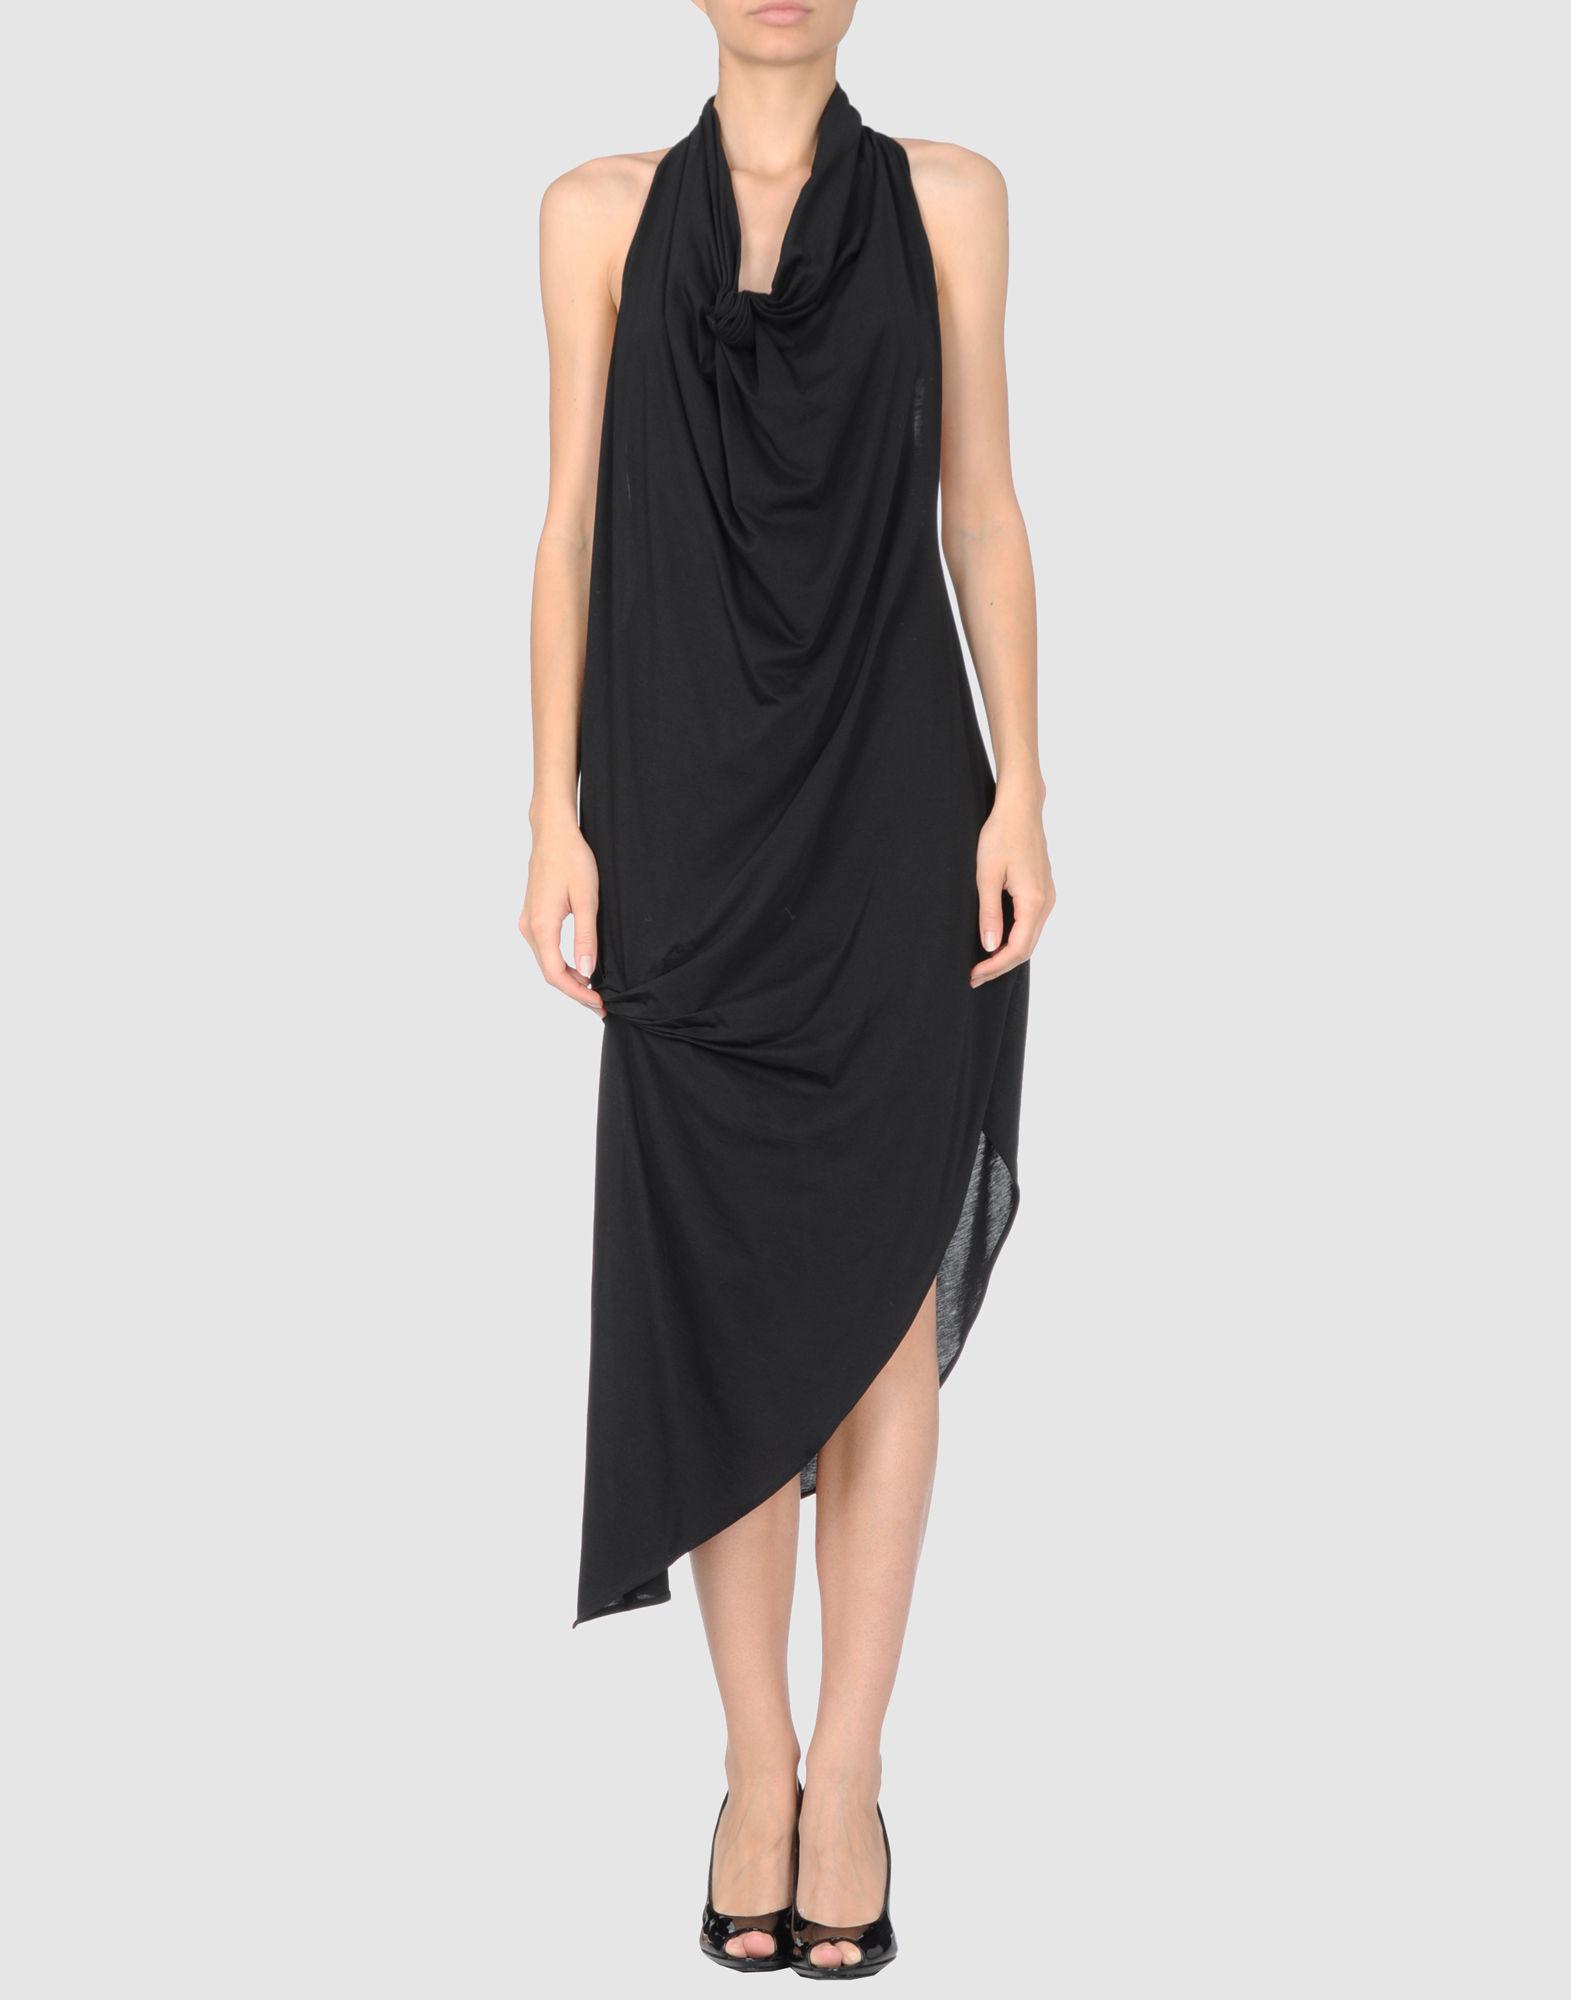 34220384GQ 14 f - Βραδυνα Φορεματα Yves Saint Laurent Rive Gauche Κωδ.22